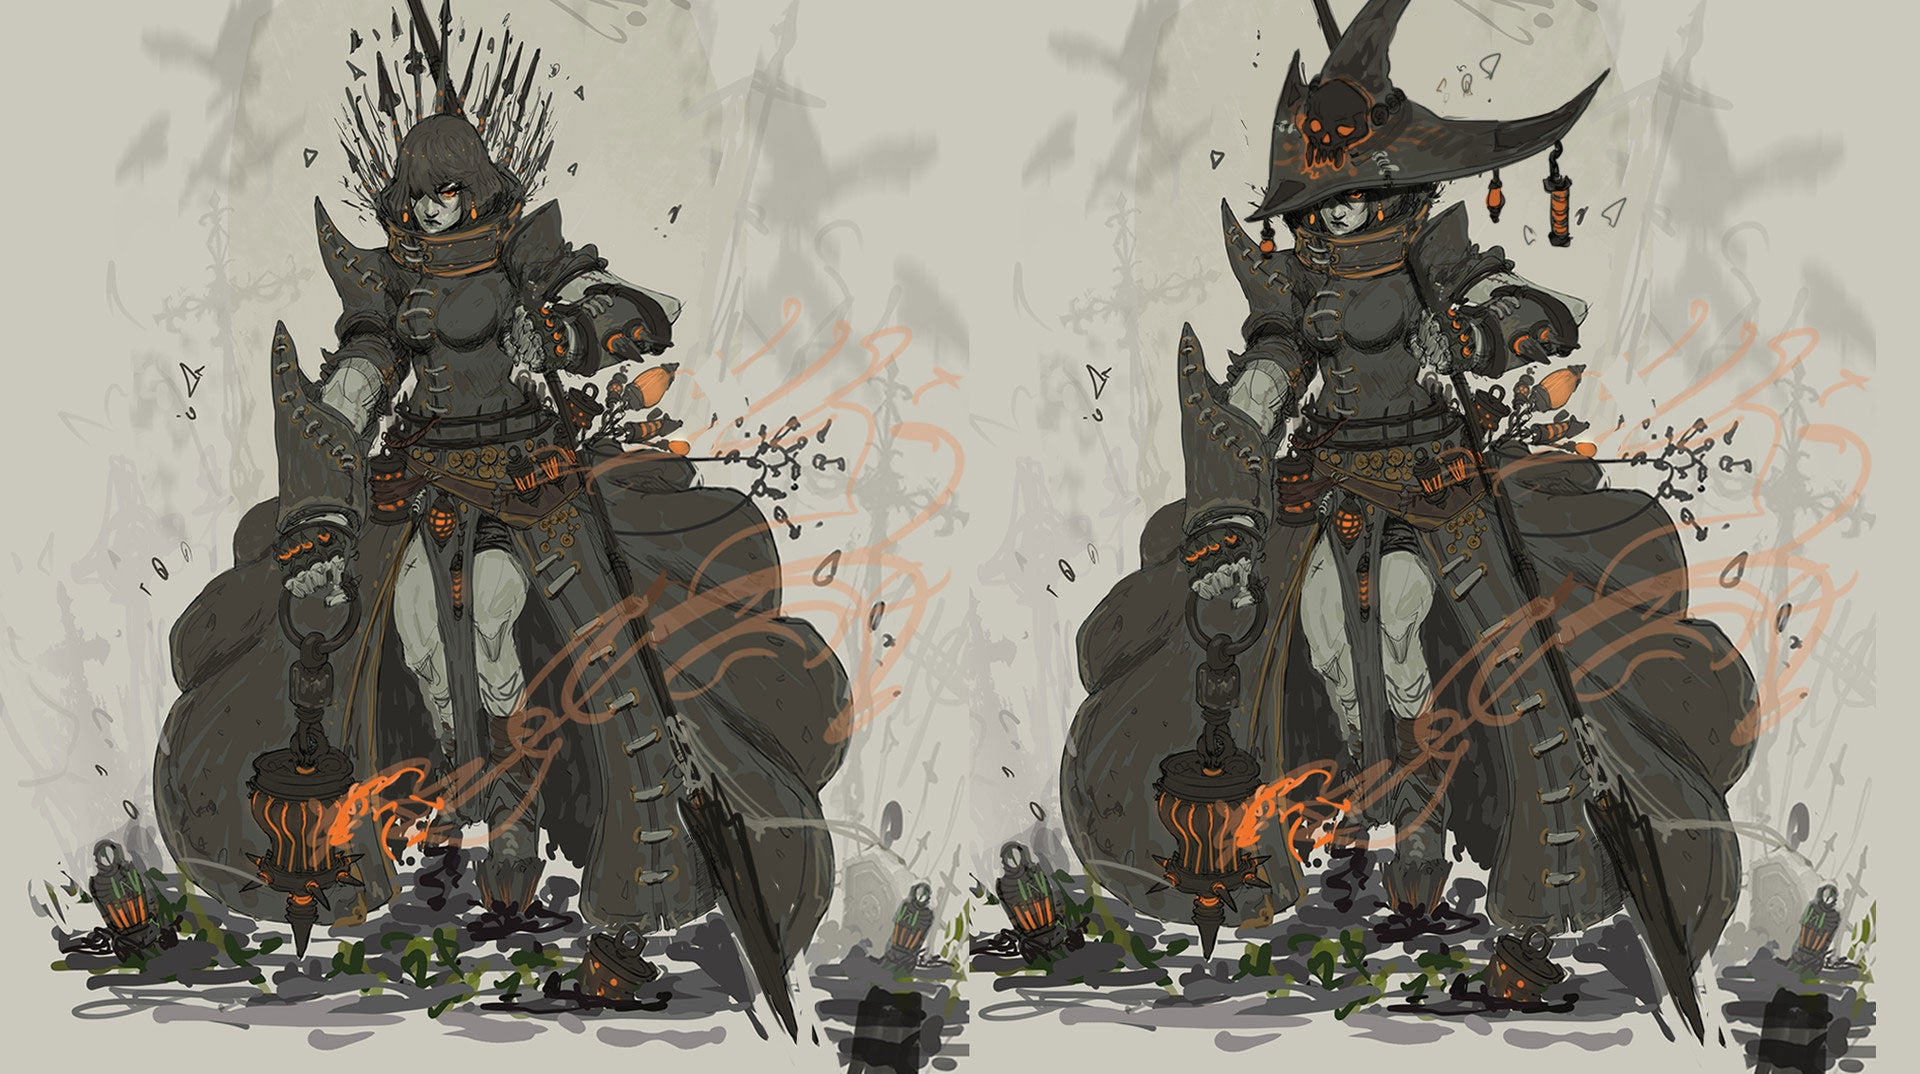 Fine Art: The Battle Witch